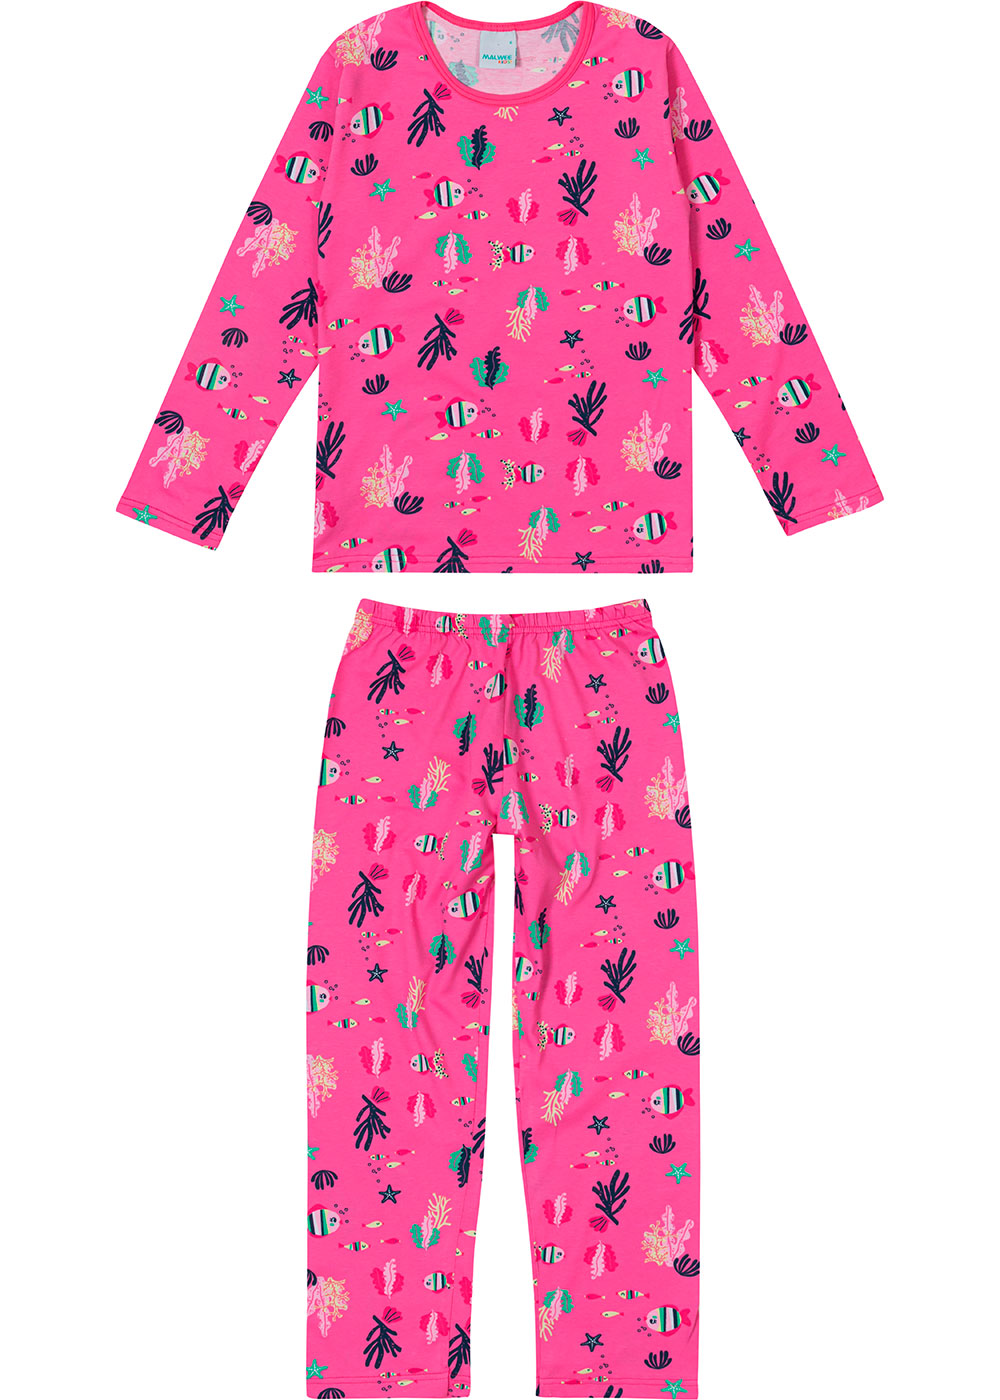 Pijama Infantil Feminino Longo Rosa Fundo do Mar - Malwee